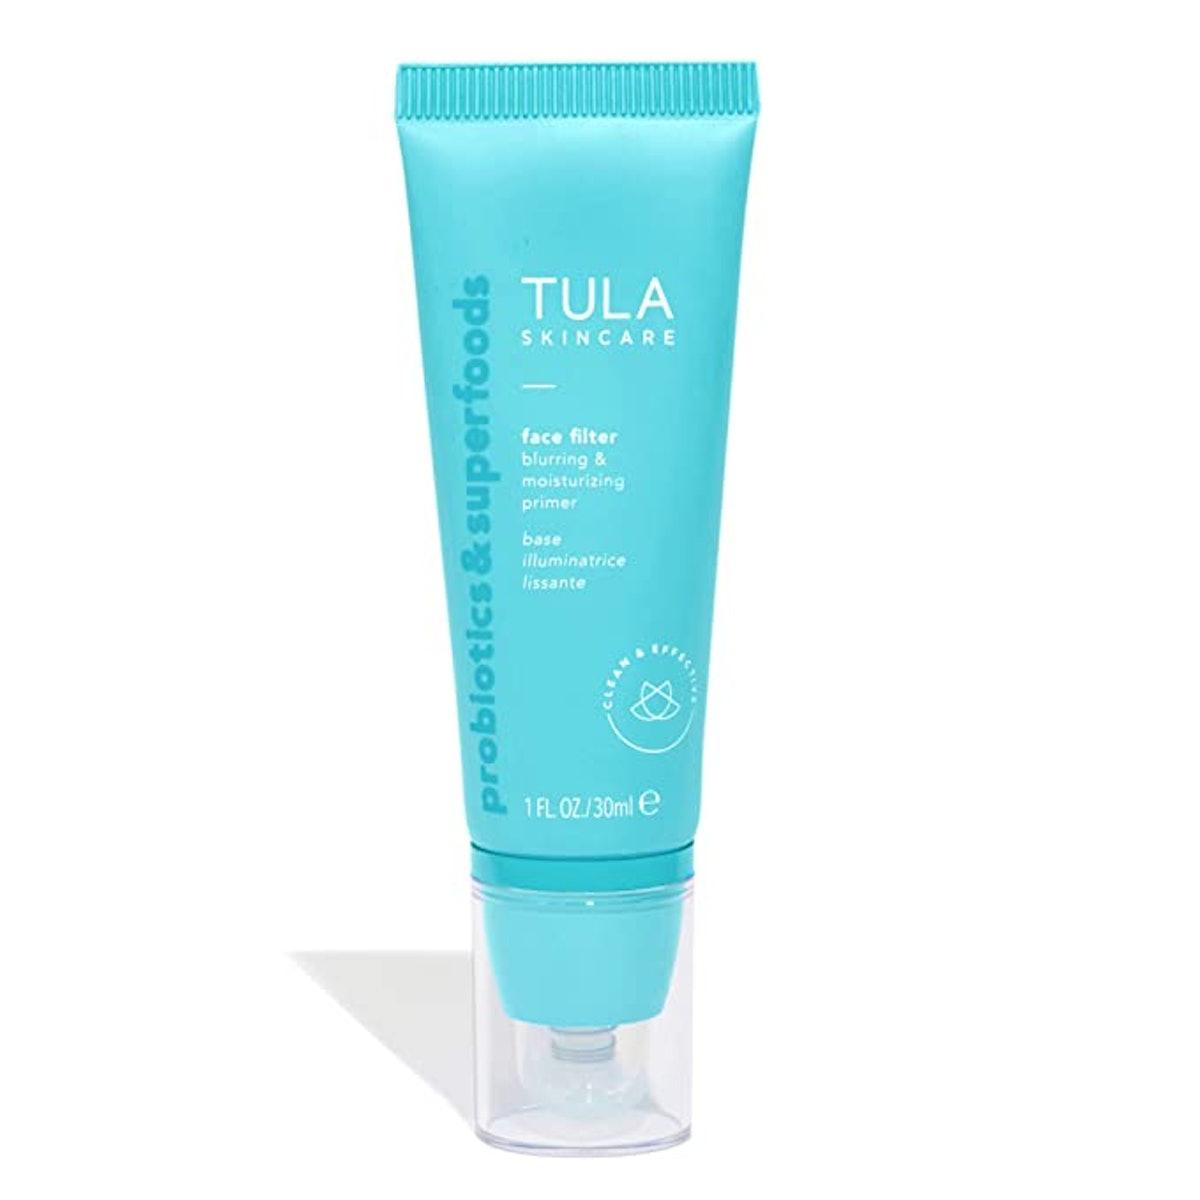 TULA Skin Care Face Blurring and Moisturizing Primer